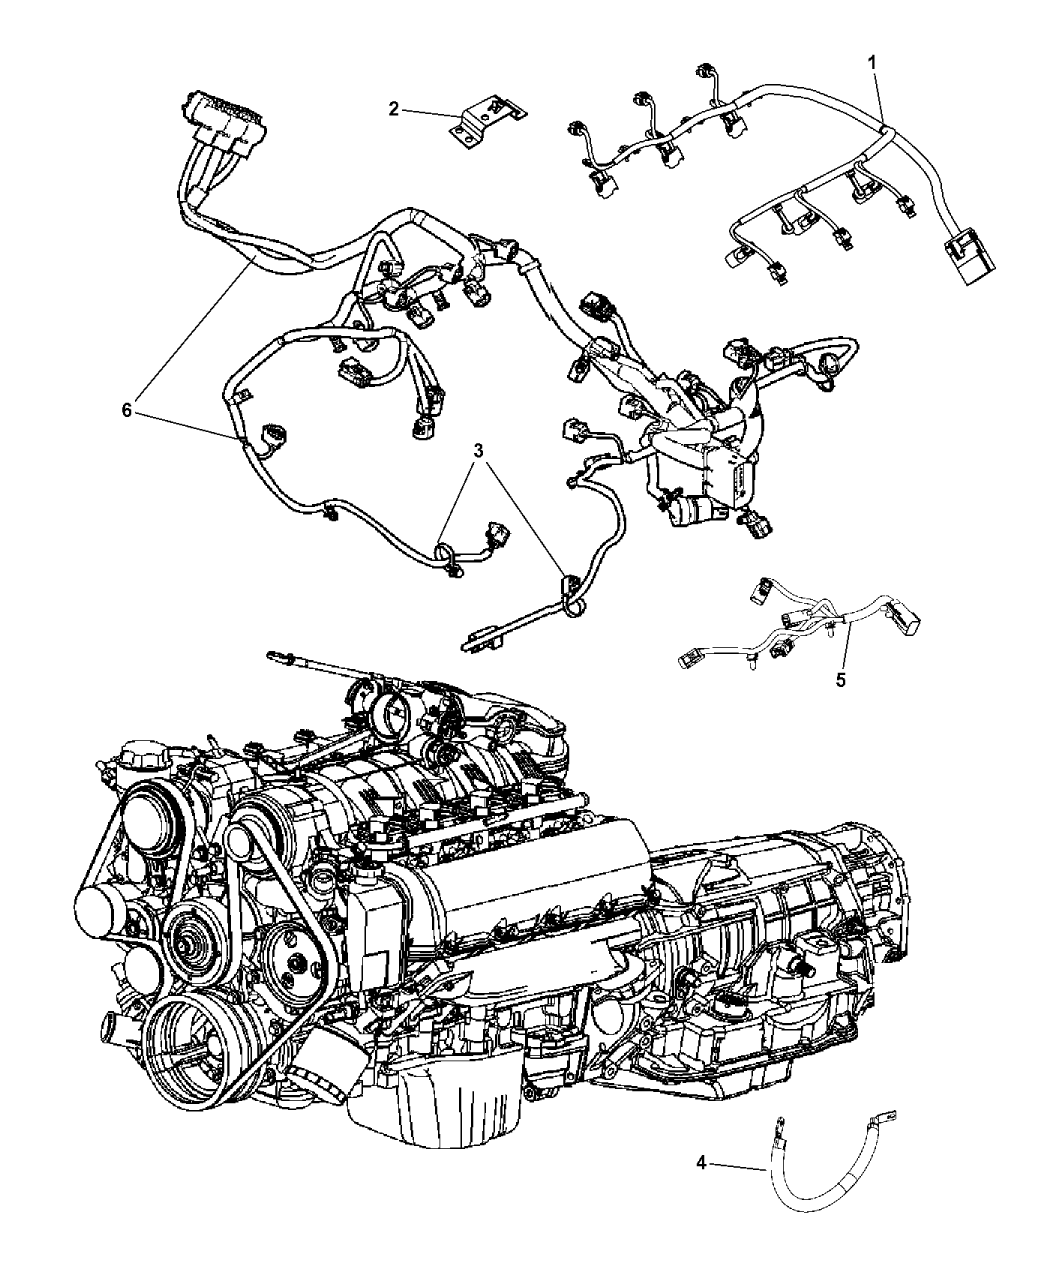 2012 jeep grand cherokee wiring diagram 68101292ac genuine mopar wiring engine  68101292ac genuine mopar wiring engine